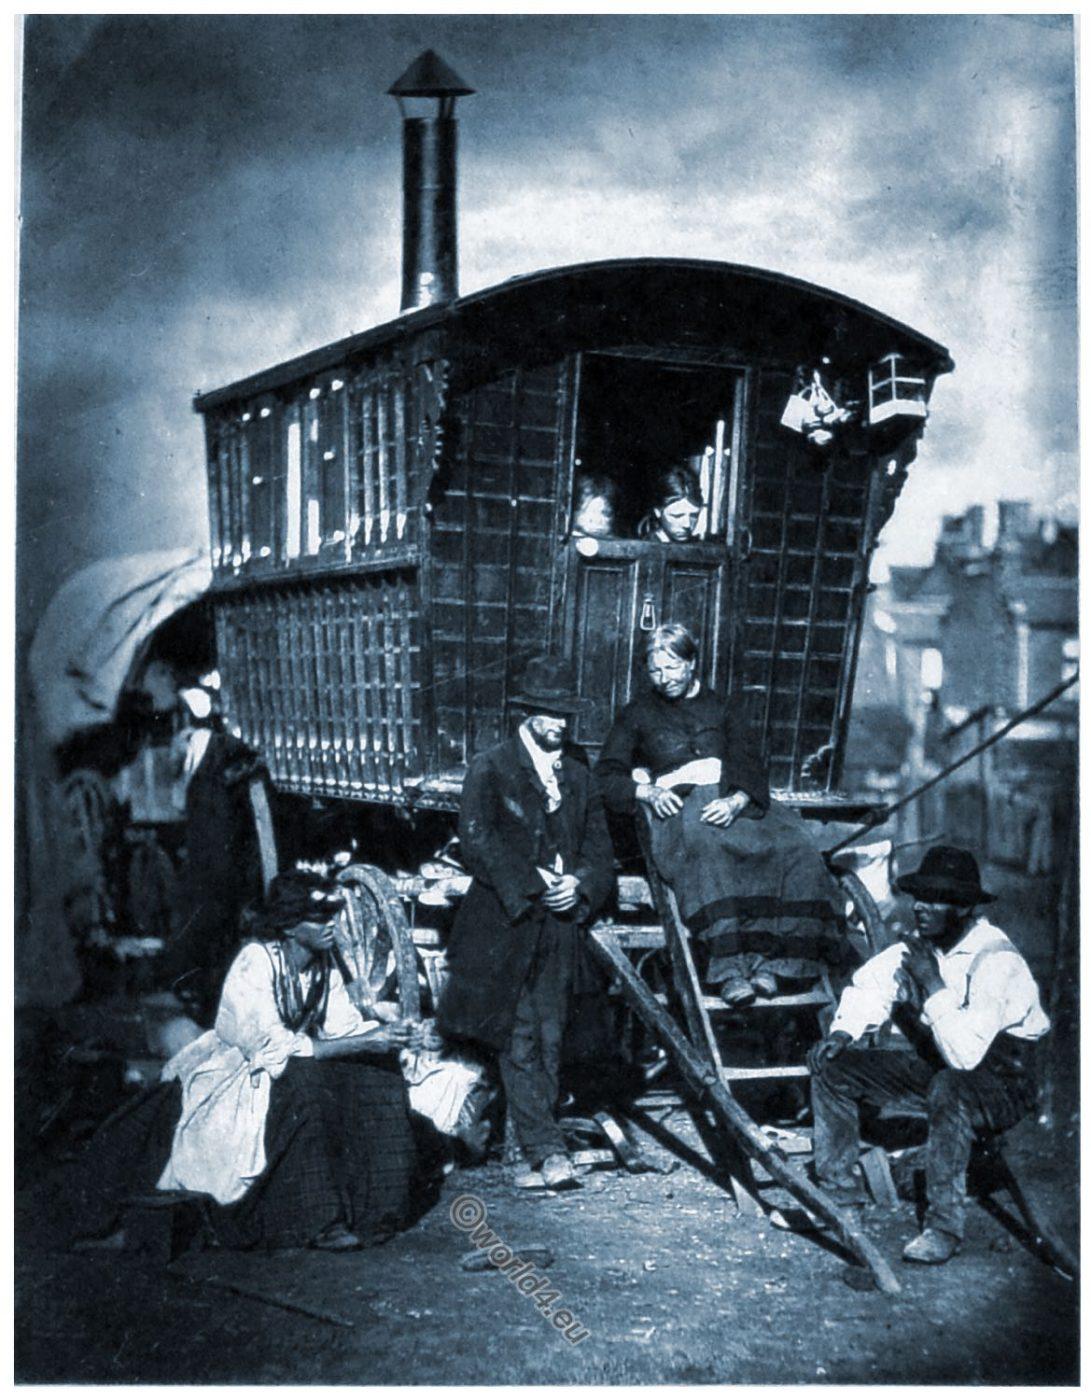 London, nomades, nomads, Gypsy, Caravan, Street Life, John Thomson, Victorian